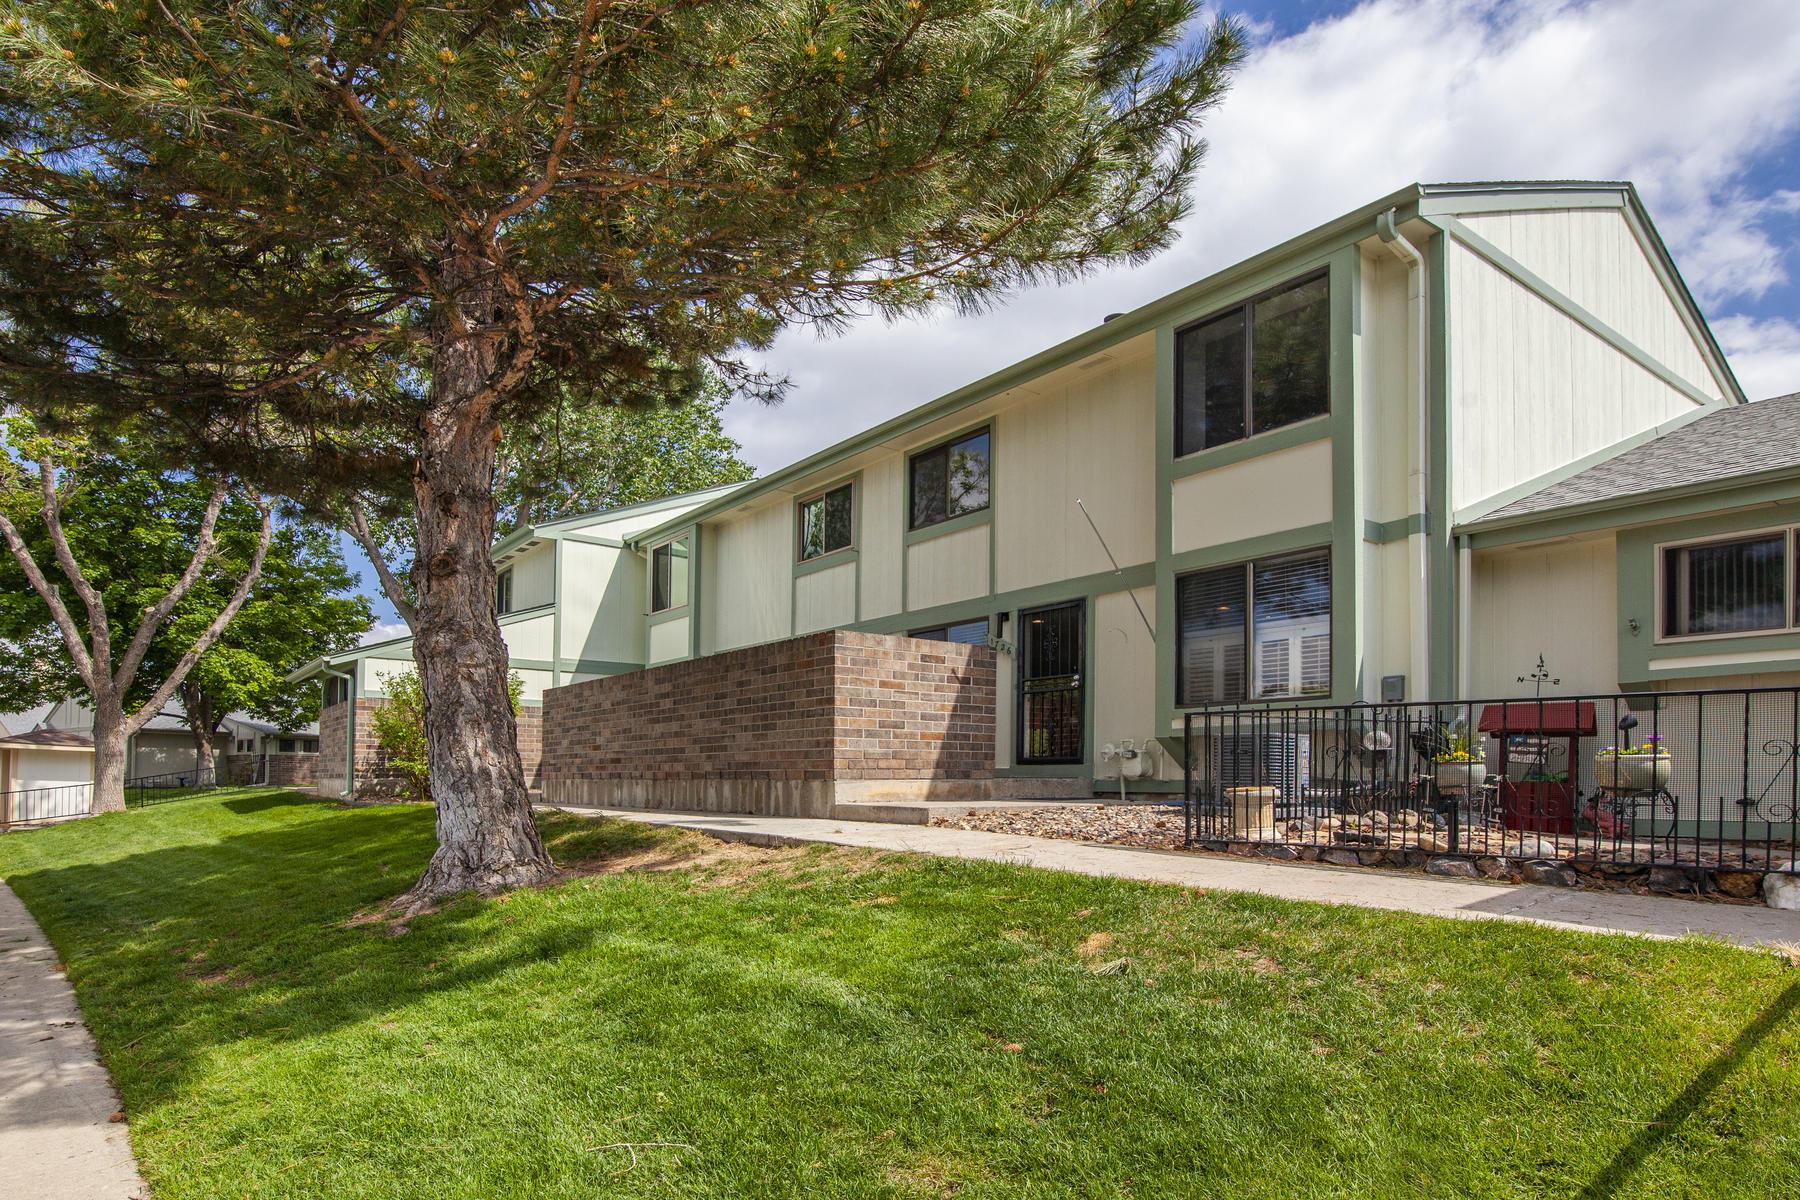 townhouses для того Продажа на Two Story Townhome in Great Location 1726 W 102nd Avenue, Thornton, Колорадо 80260 Соединенные Штаты